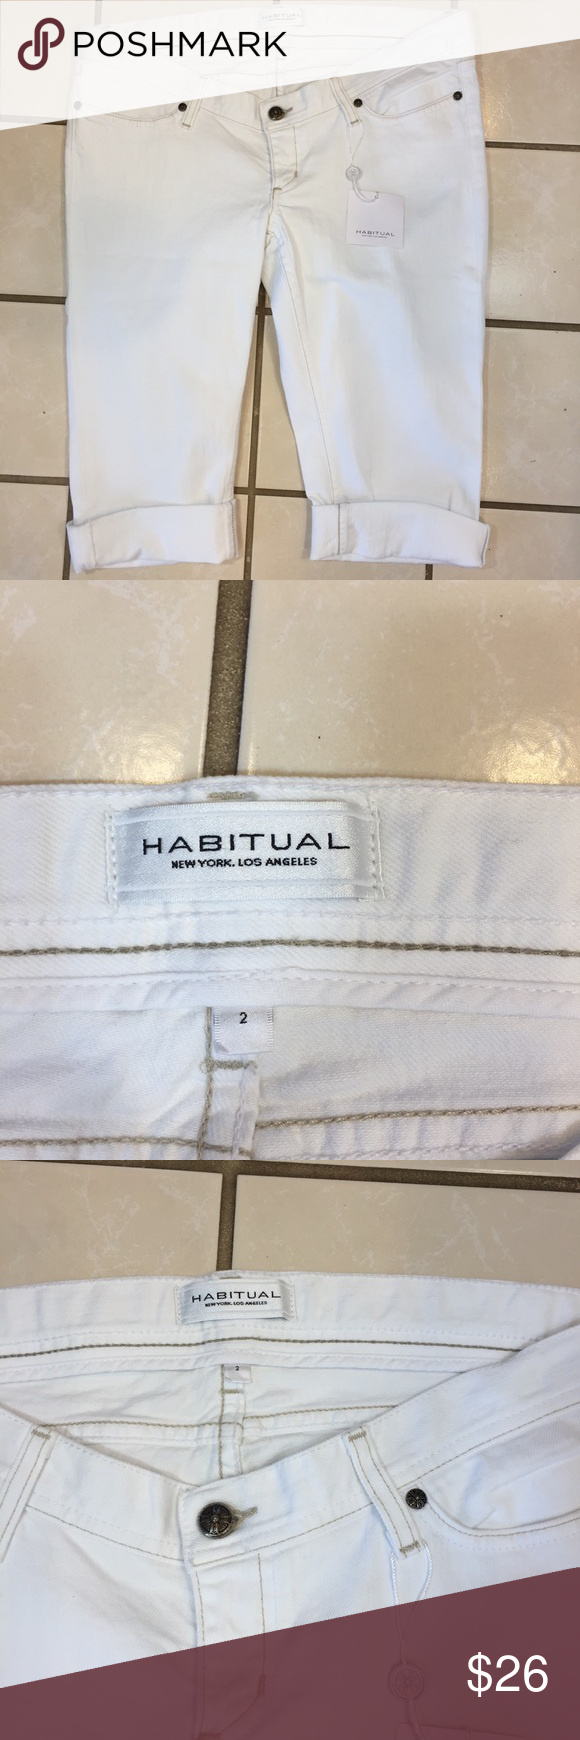 Capri Denim Jeans Habitual New Shorts Tags With Cuffed White 31 mNwOn80v